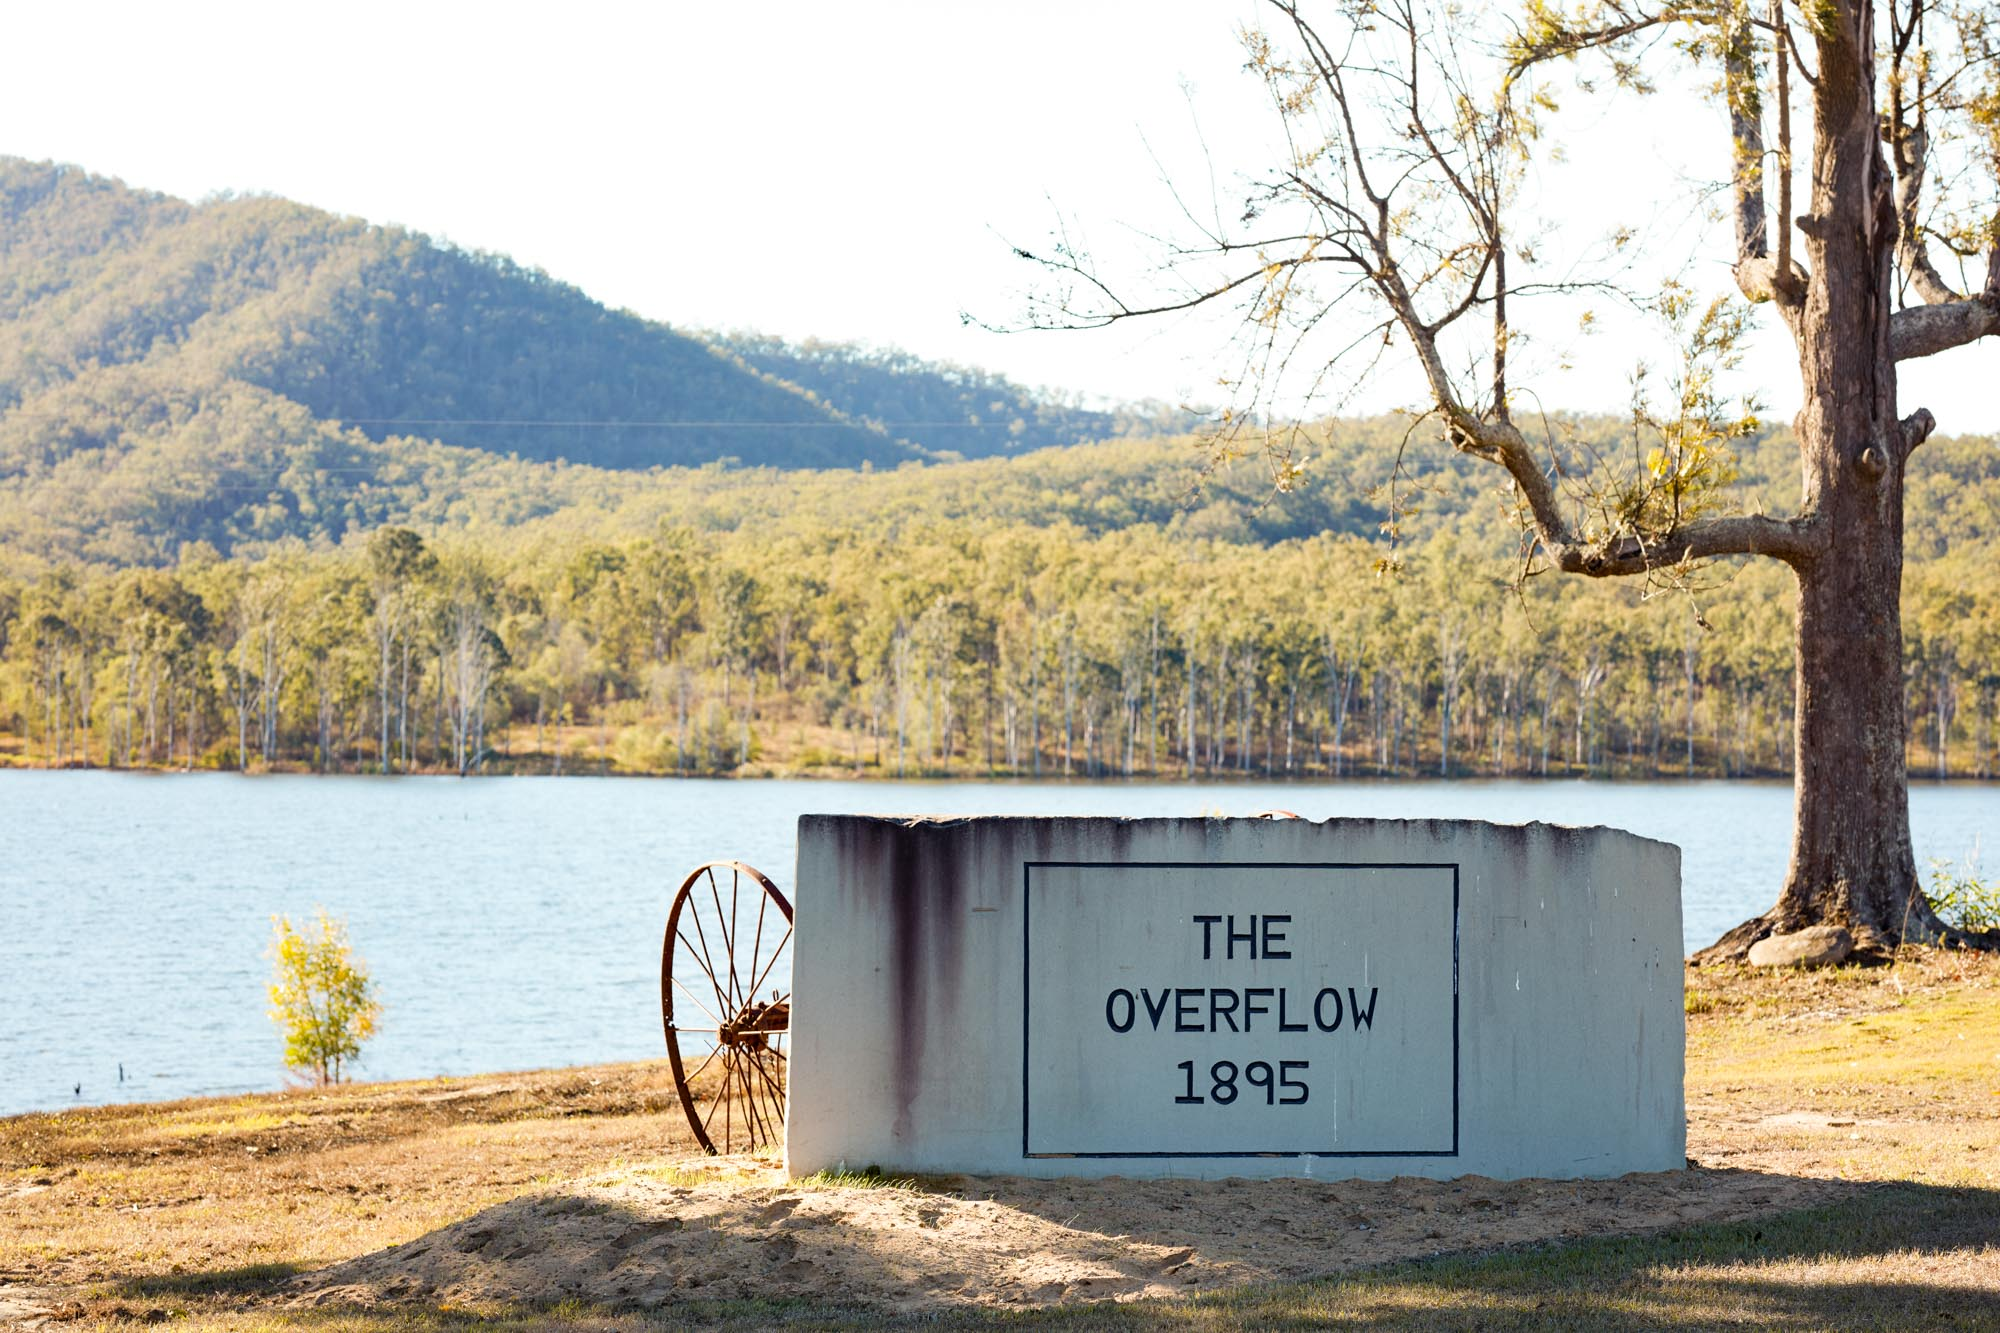 The overflow estate entrance